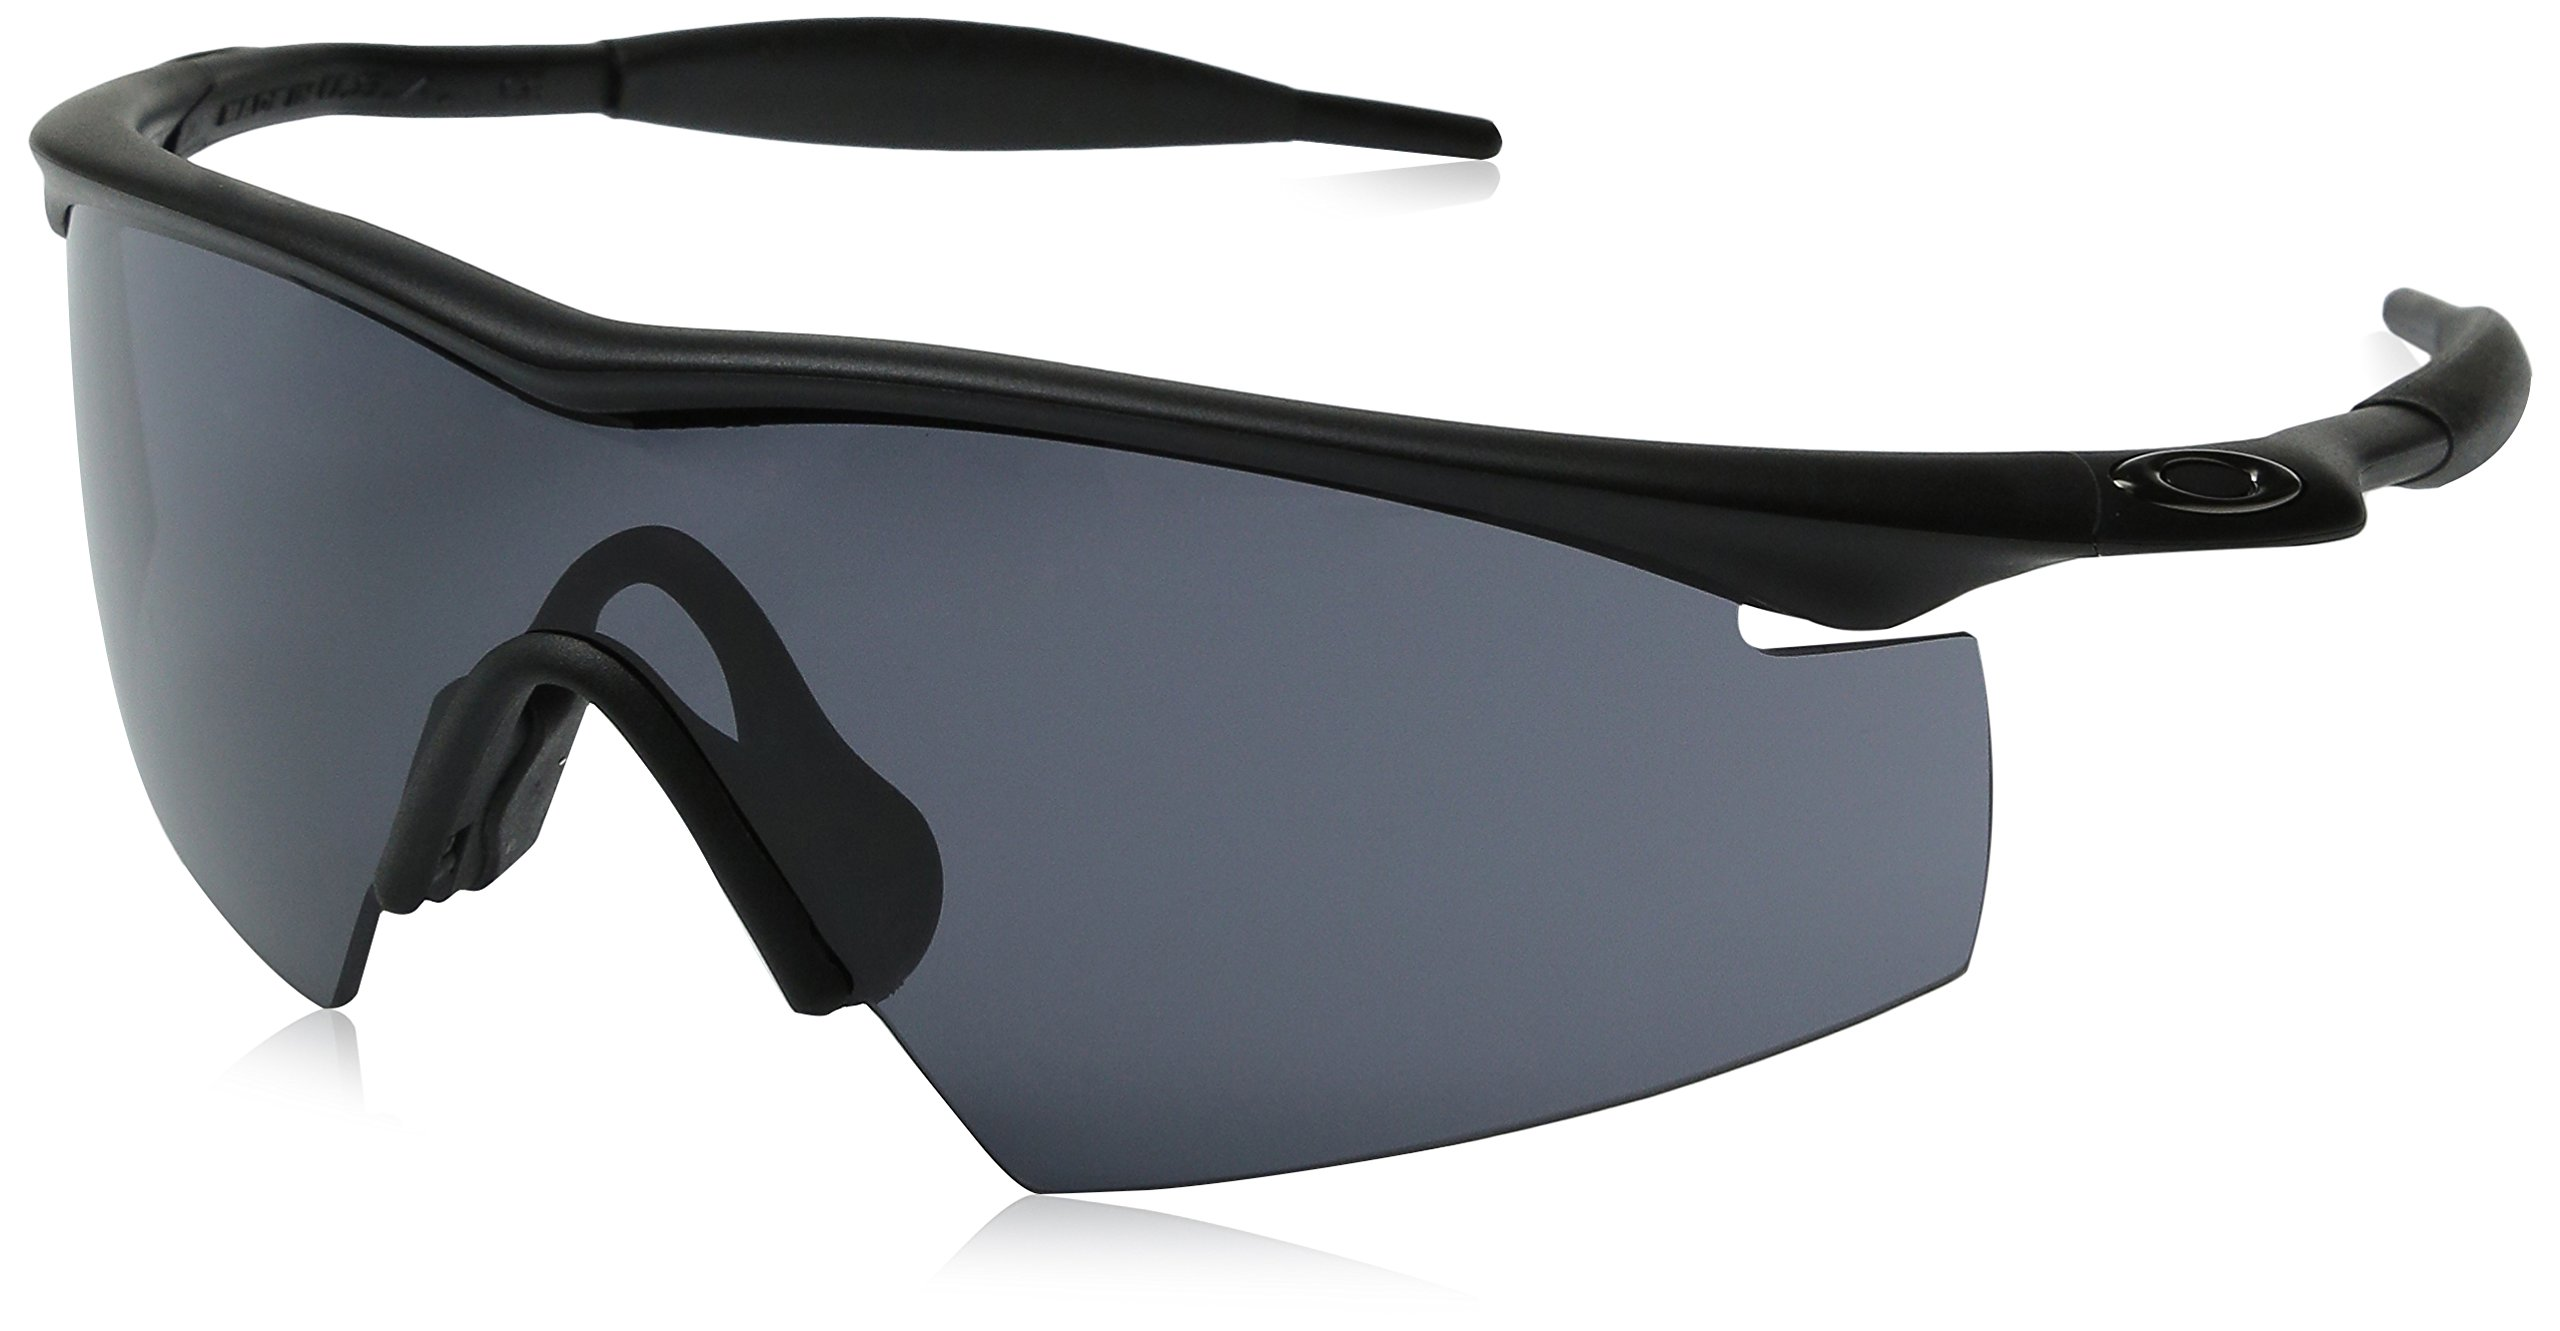 91c2453c3ff8 Get Quotations · Oakley Men OO9060 Ballistic M Frame Sunglasses 34mm